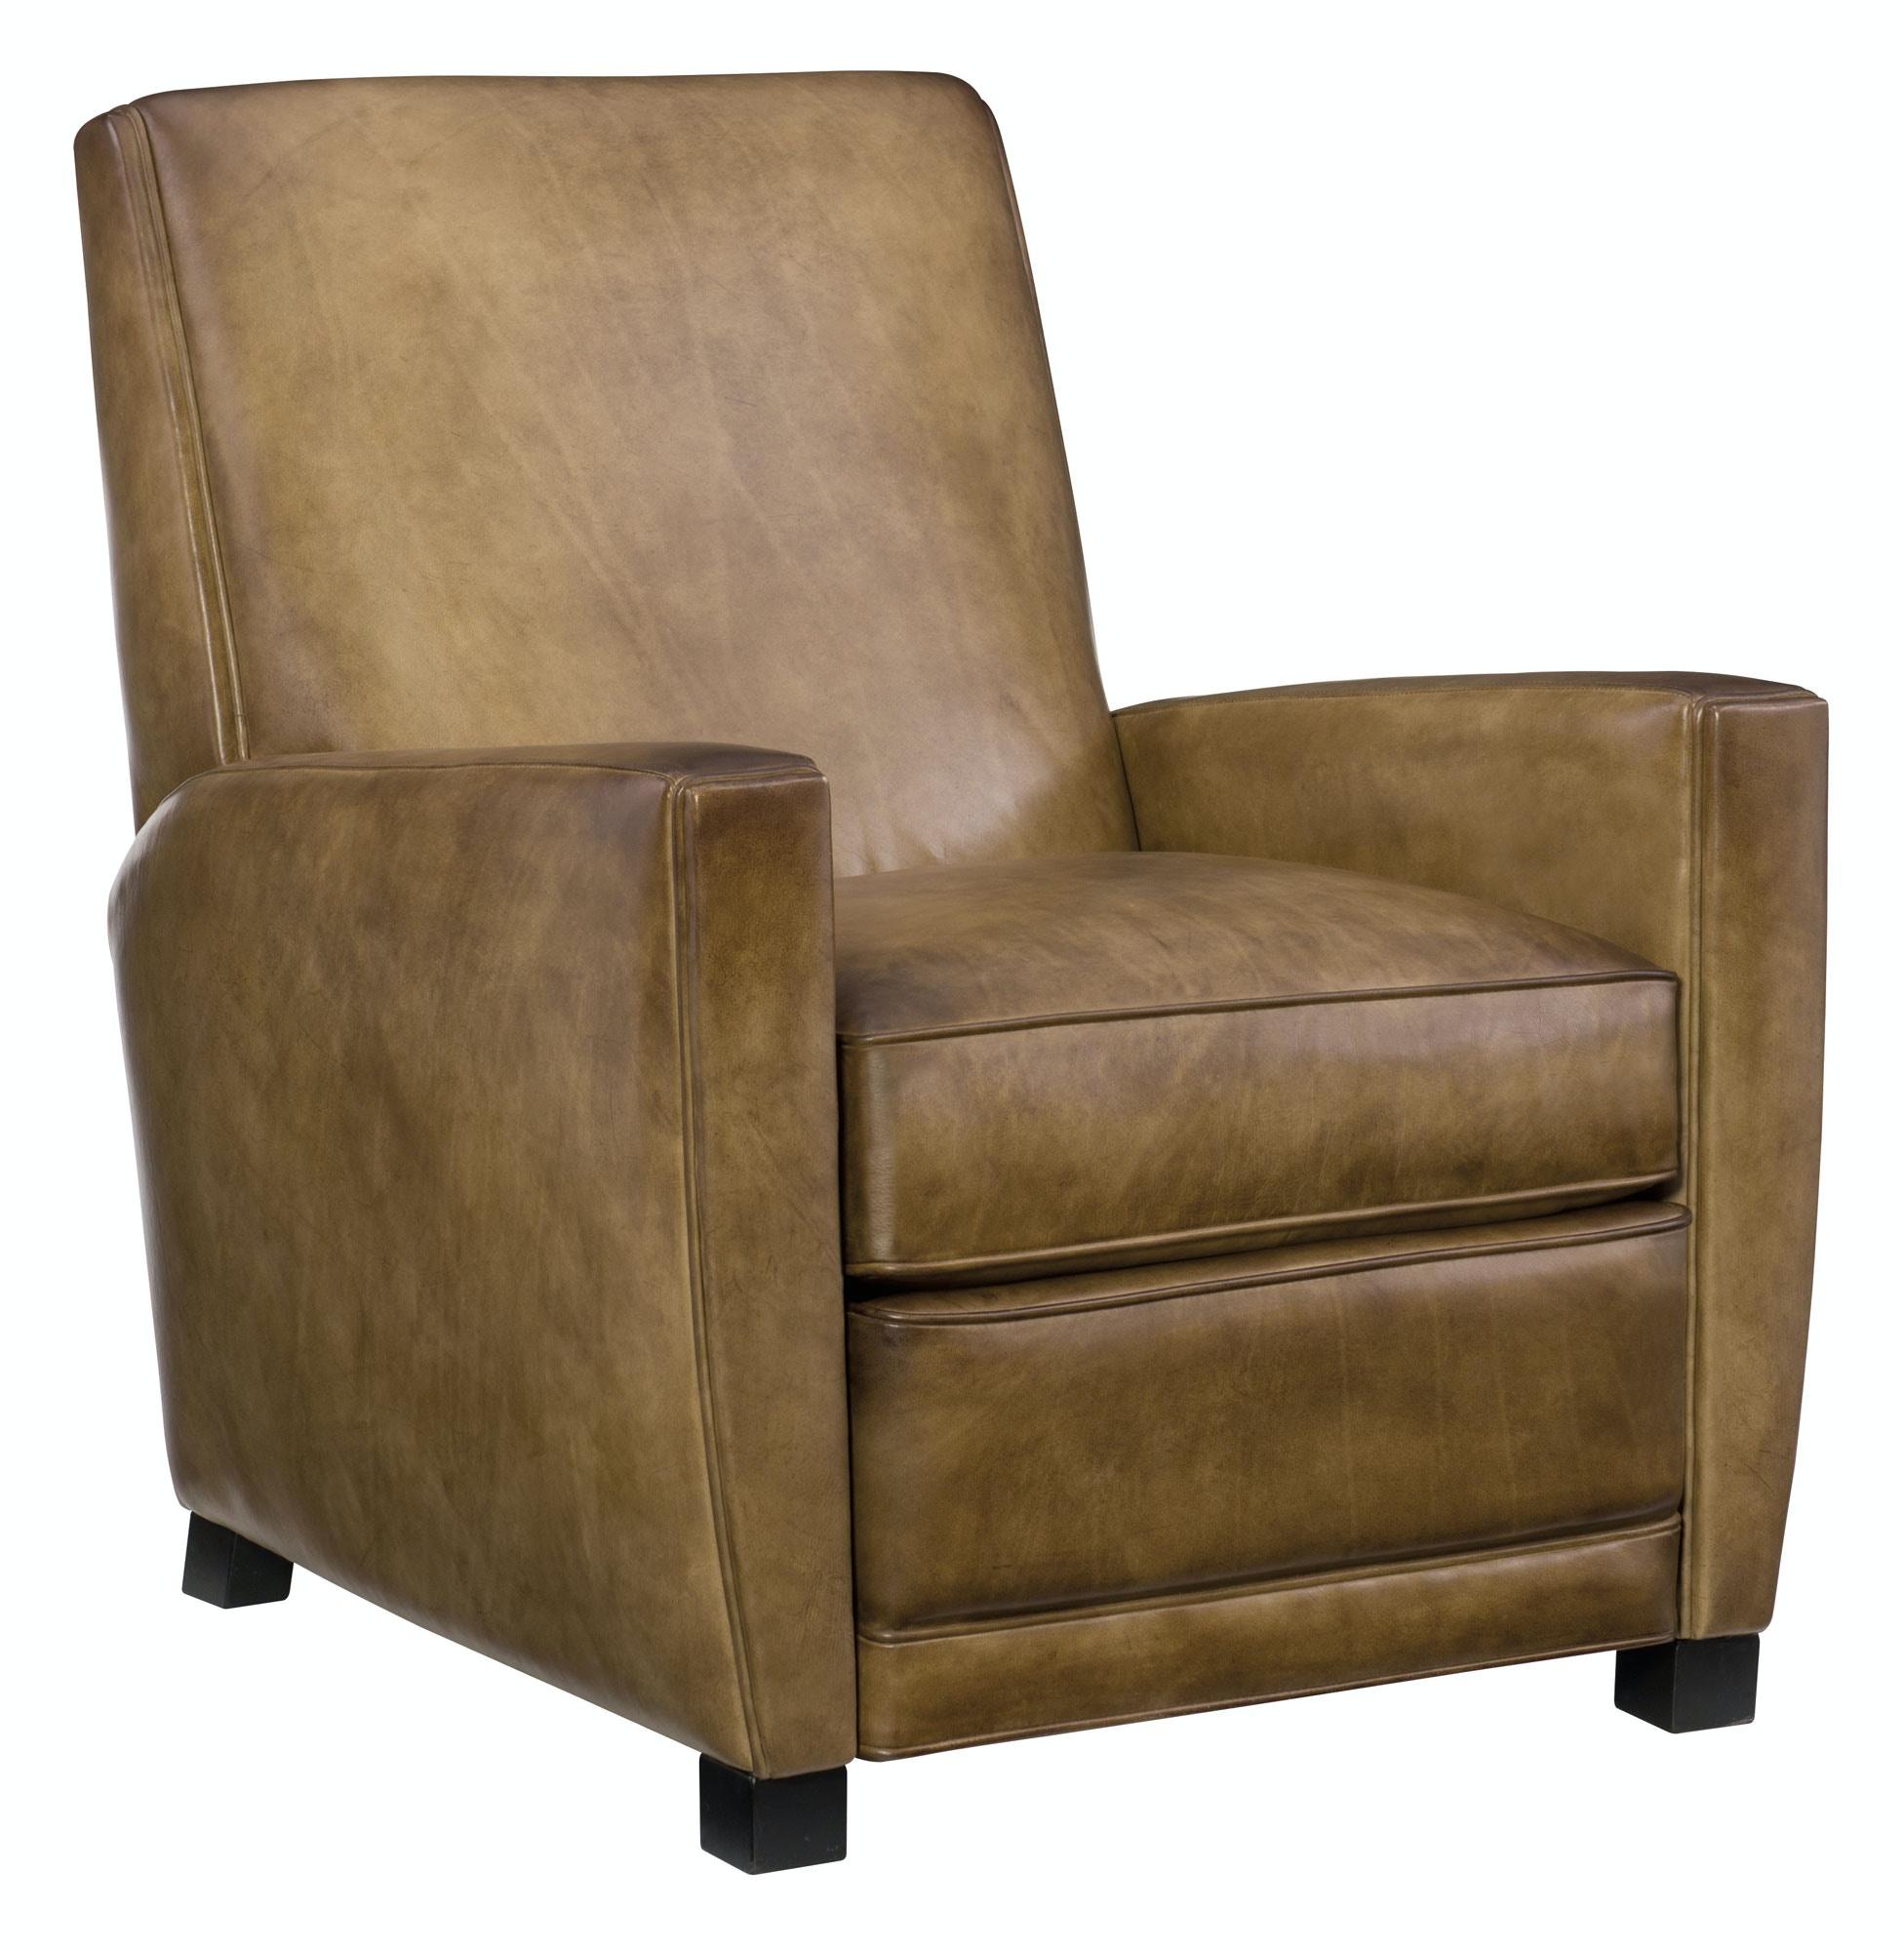 Barrett Reclining Leather Chair By Bernhardt In Original